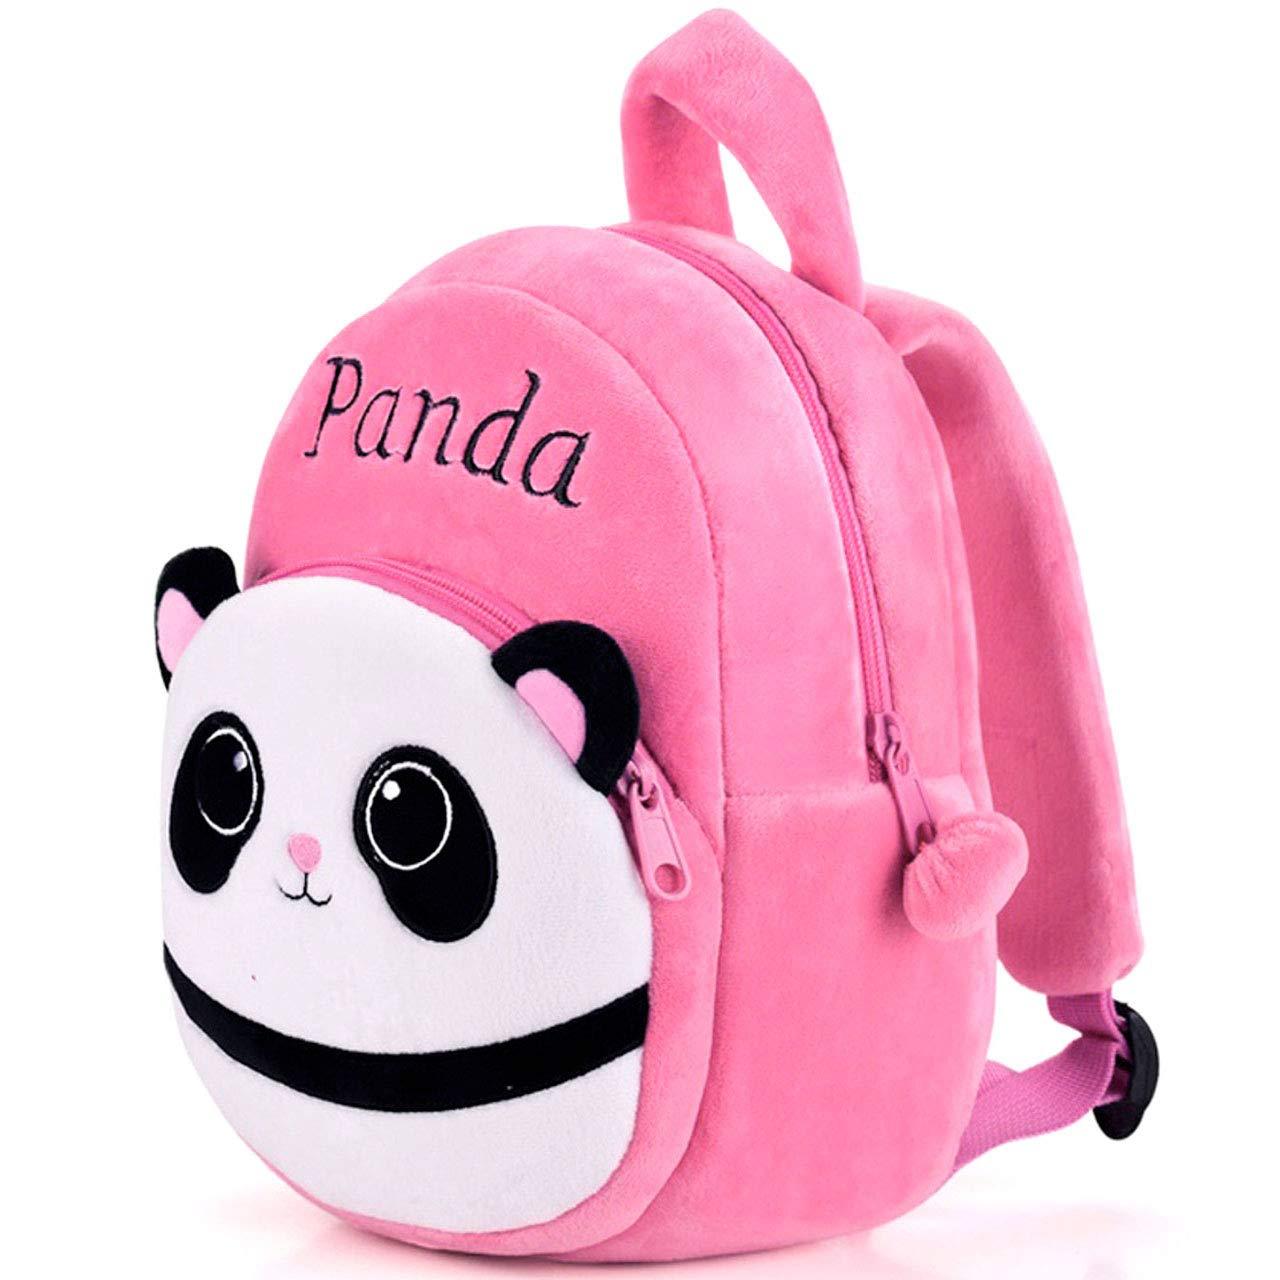 DZert Panda Kids School Bag Soft Plush Backpacks Cartoon Boys Girls Baby  (2-5 Years) Pink: Amazon.in: Bags, Wallets & Luggage